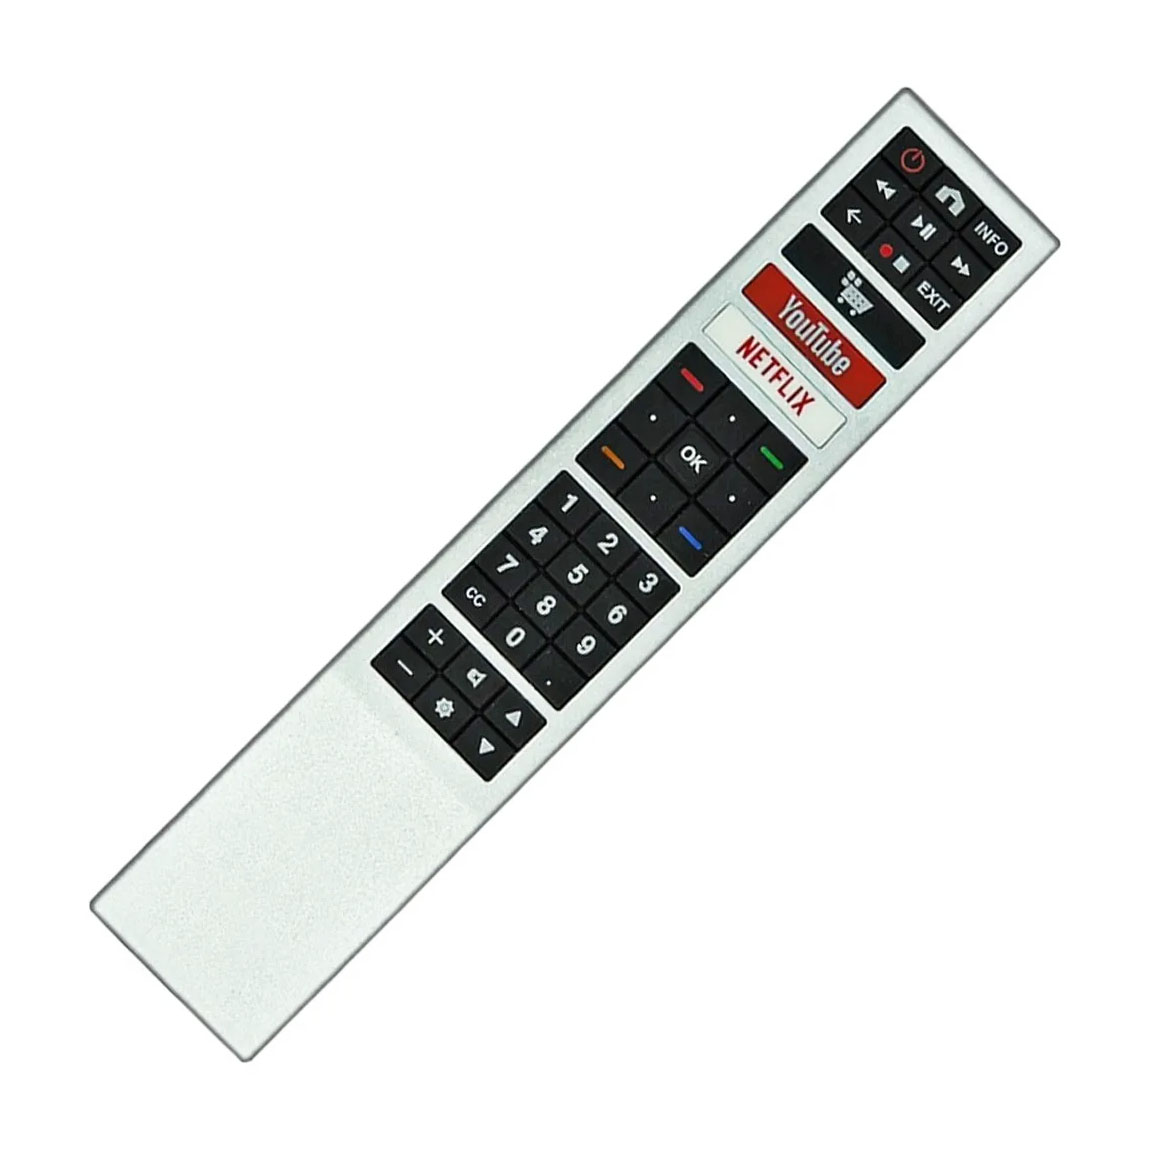 CONTROLE REMOTO PARA TV AOC  SKY-9061 VC-A8251 LE-7411 COMPATÍVEL